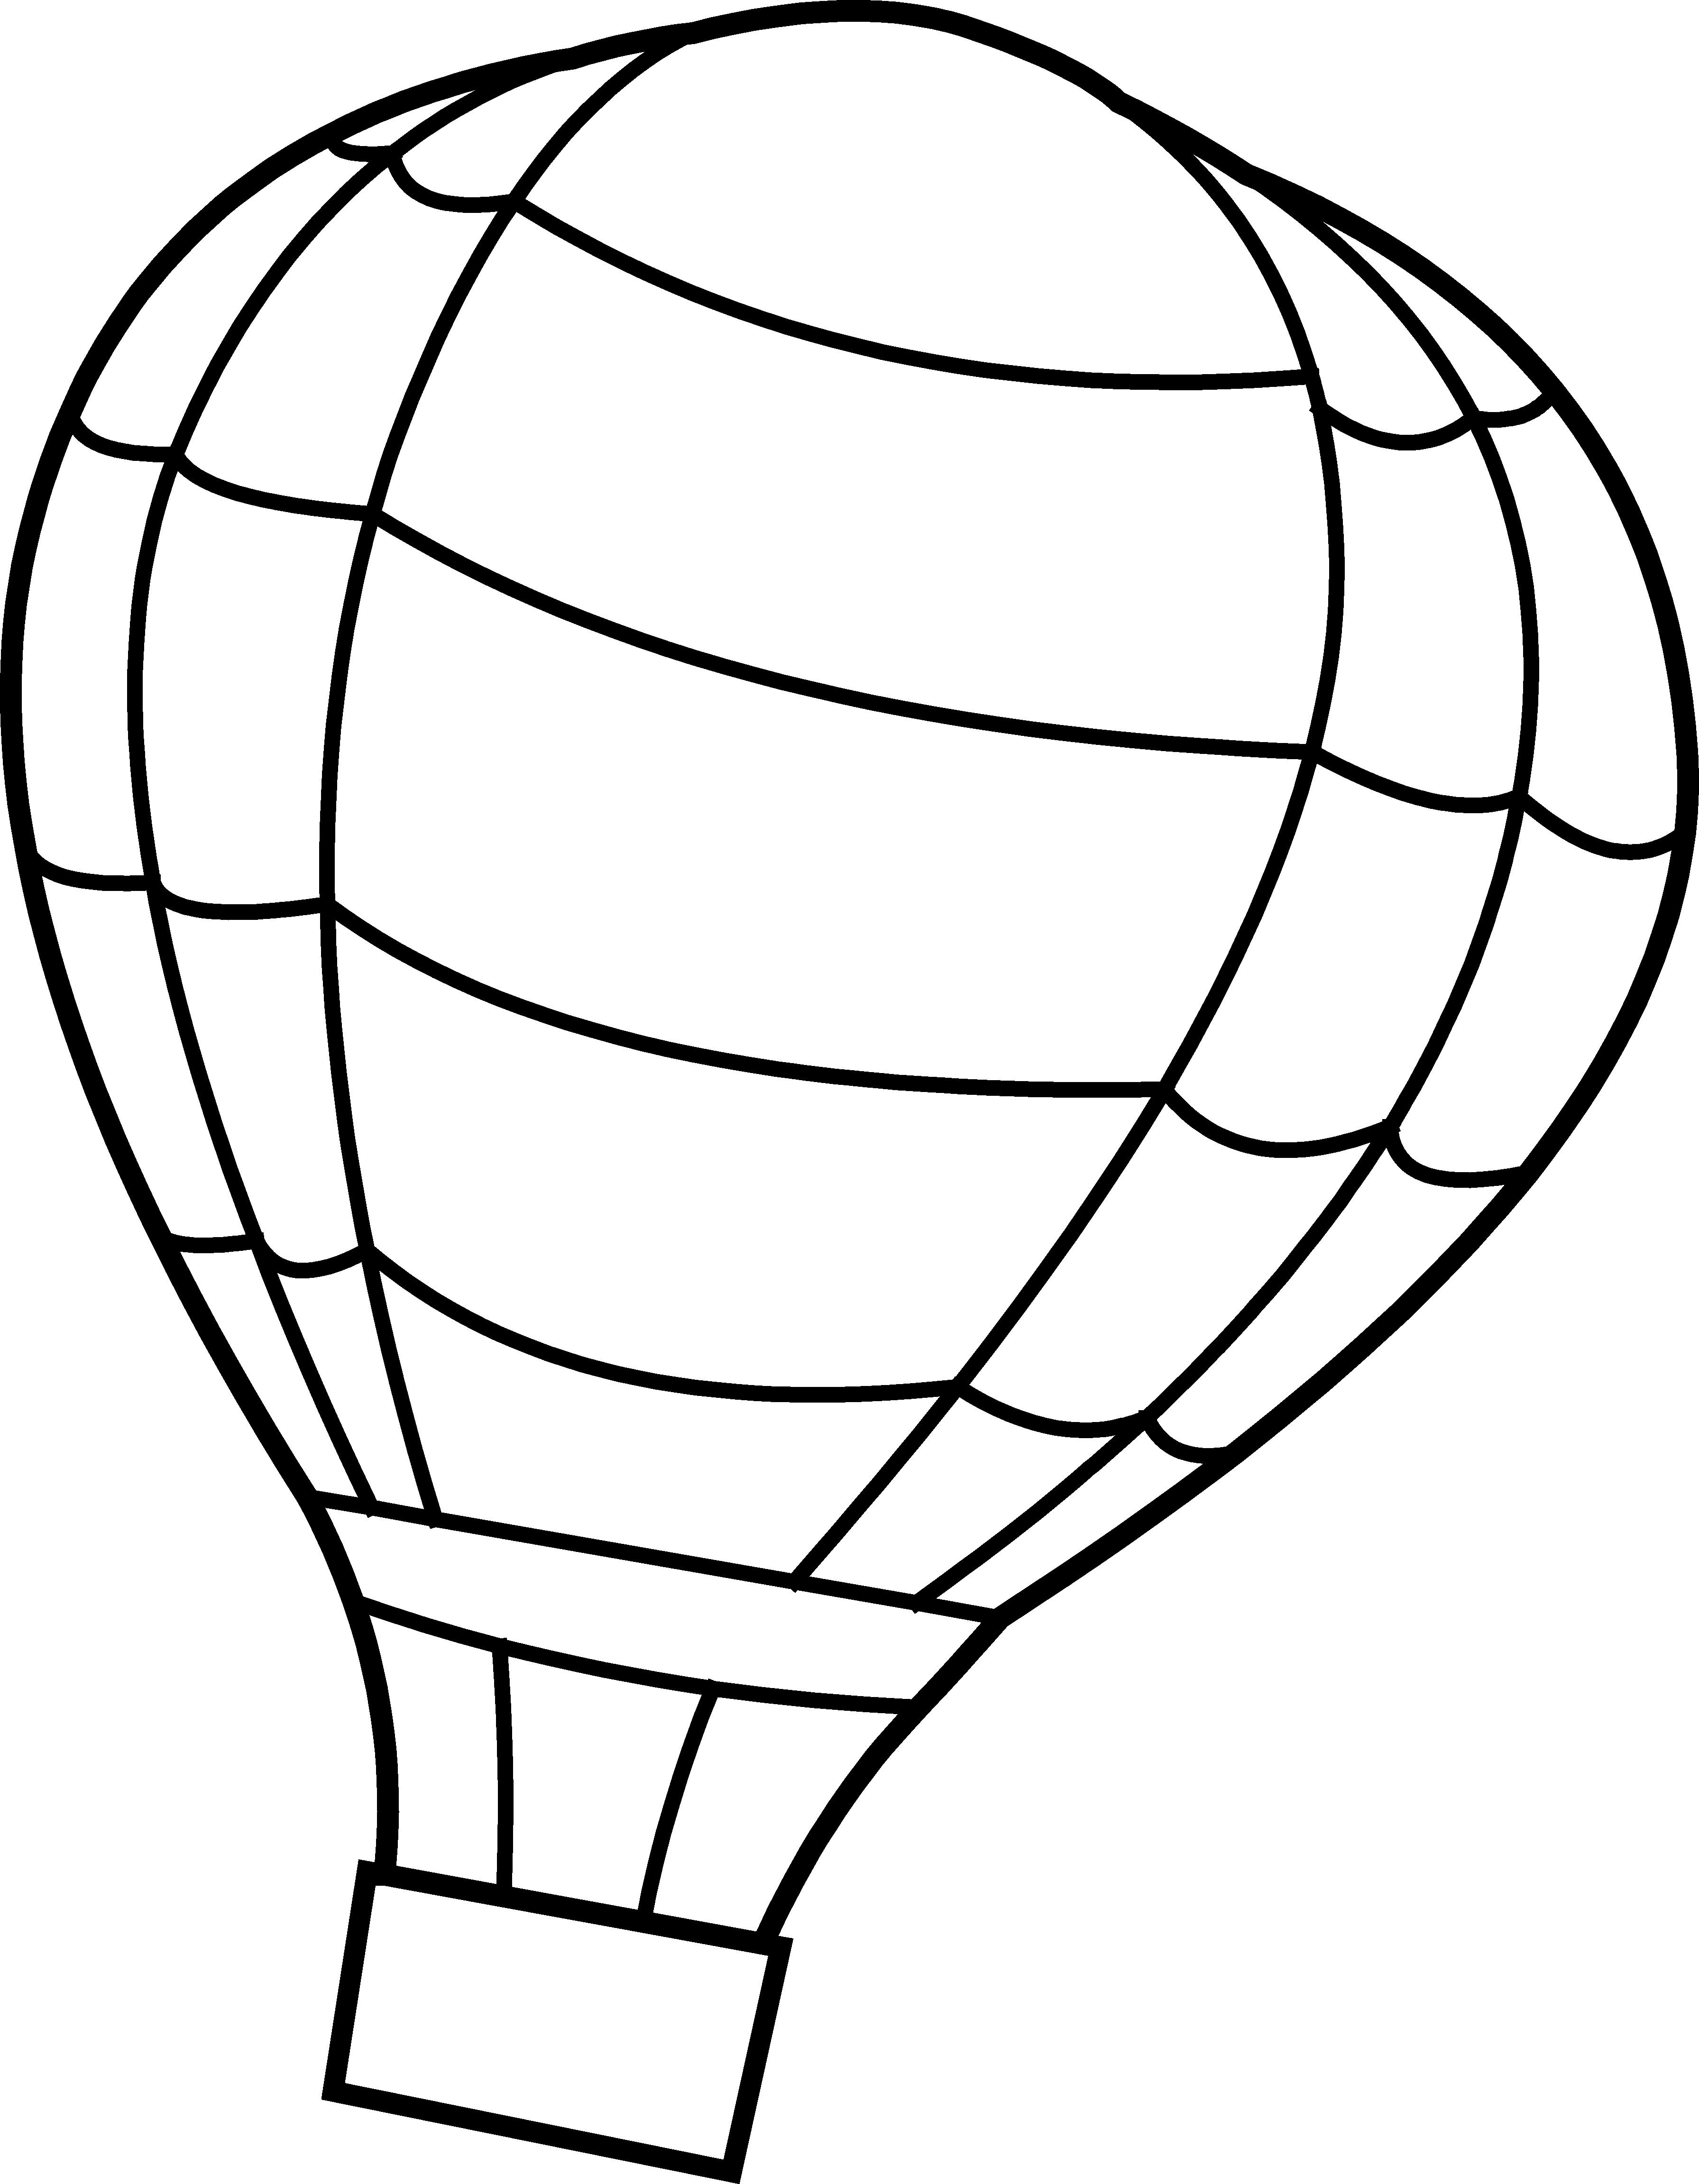 Black And White Hot Air Balloon Clipart.